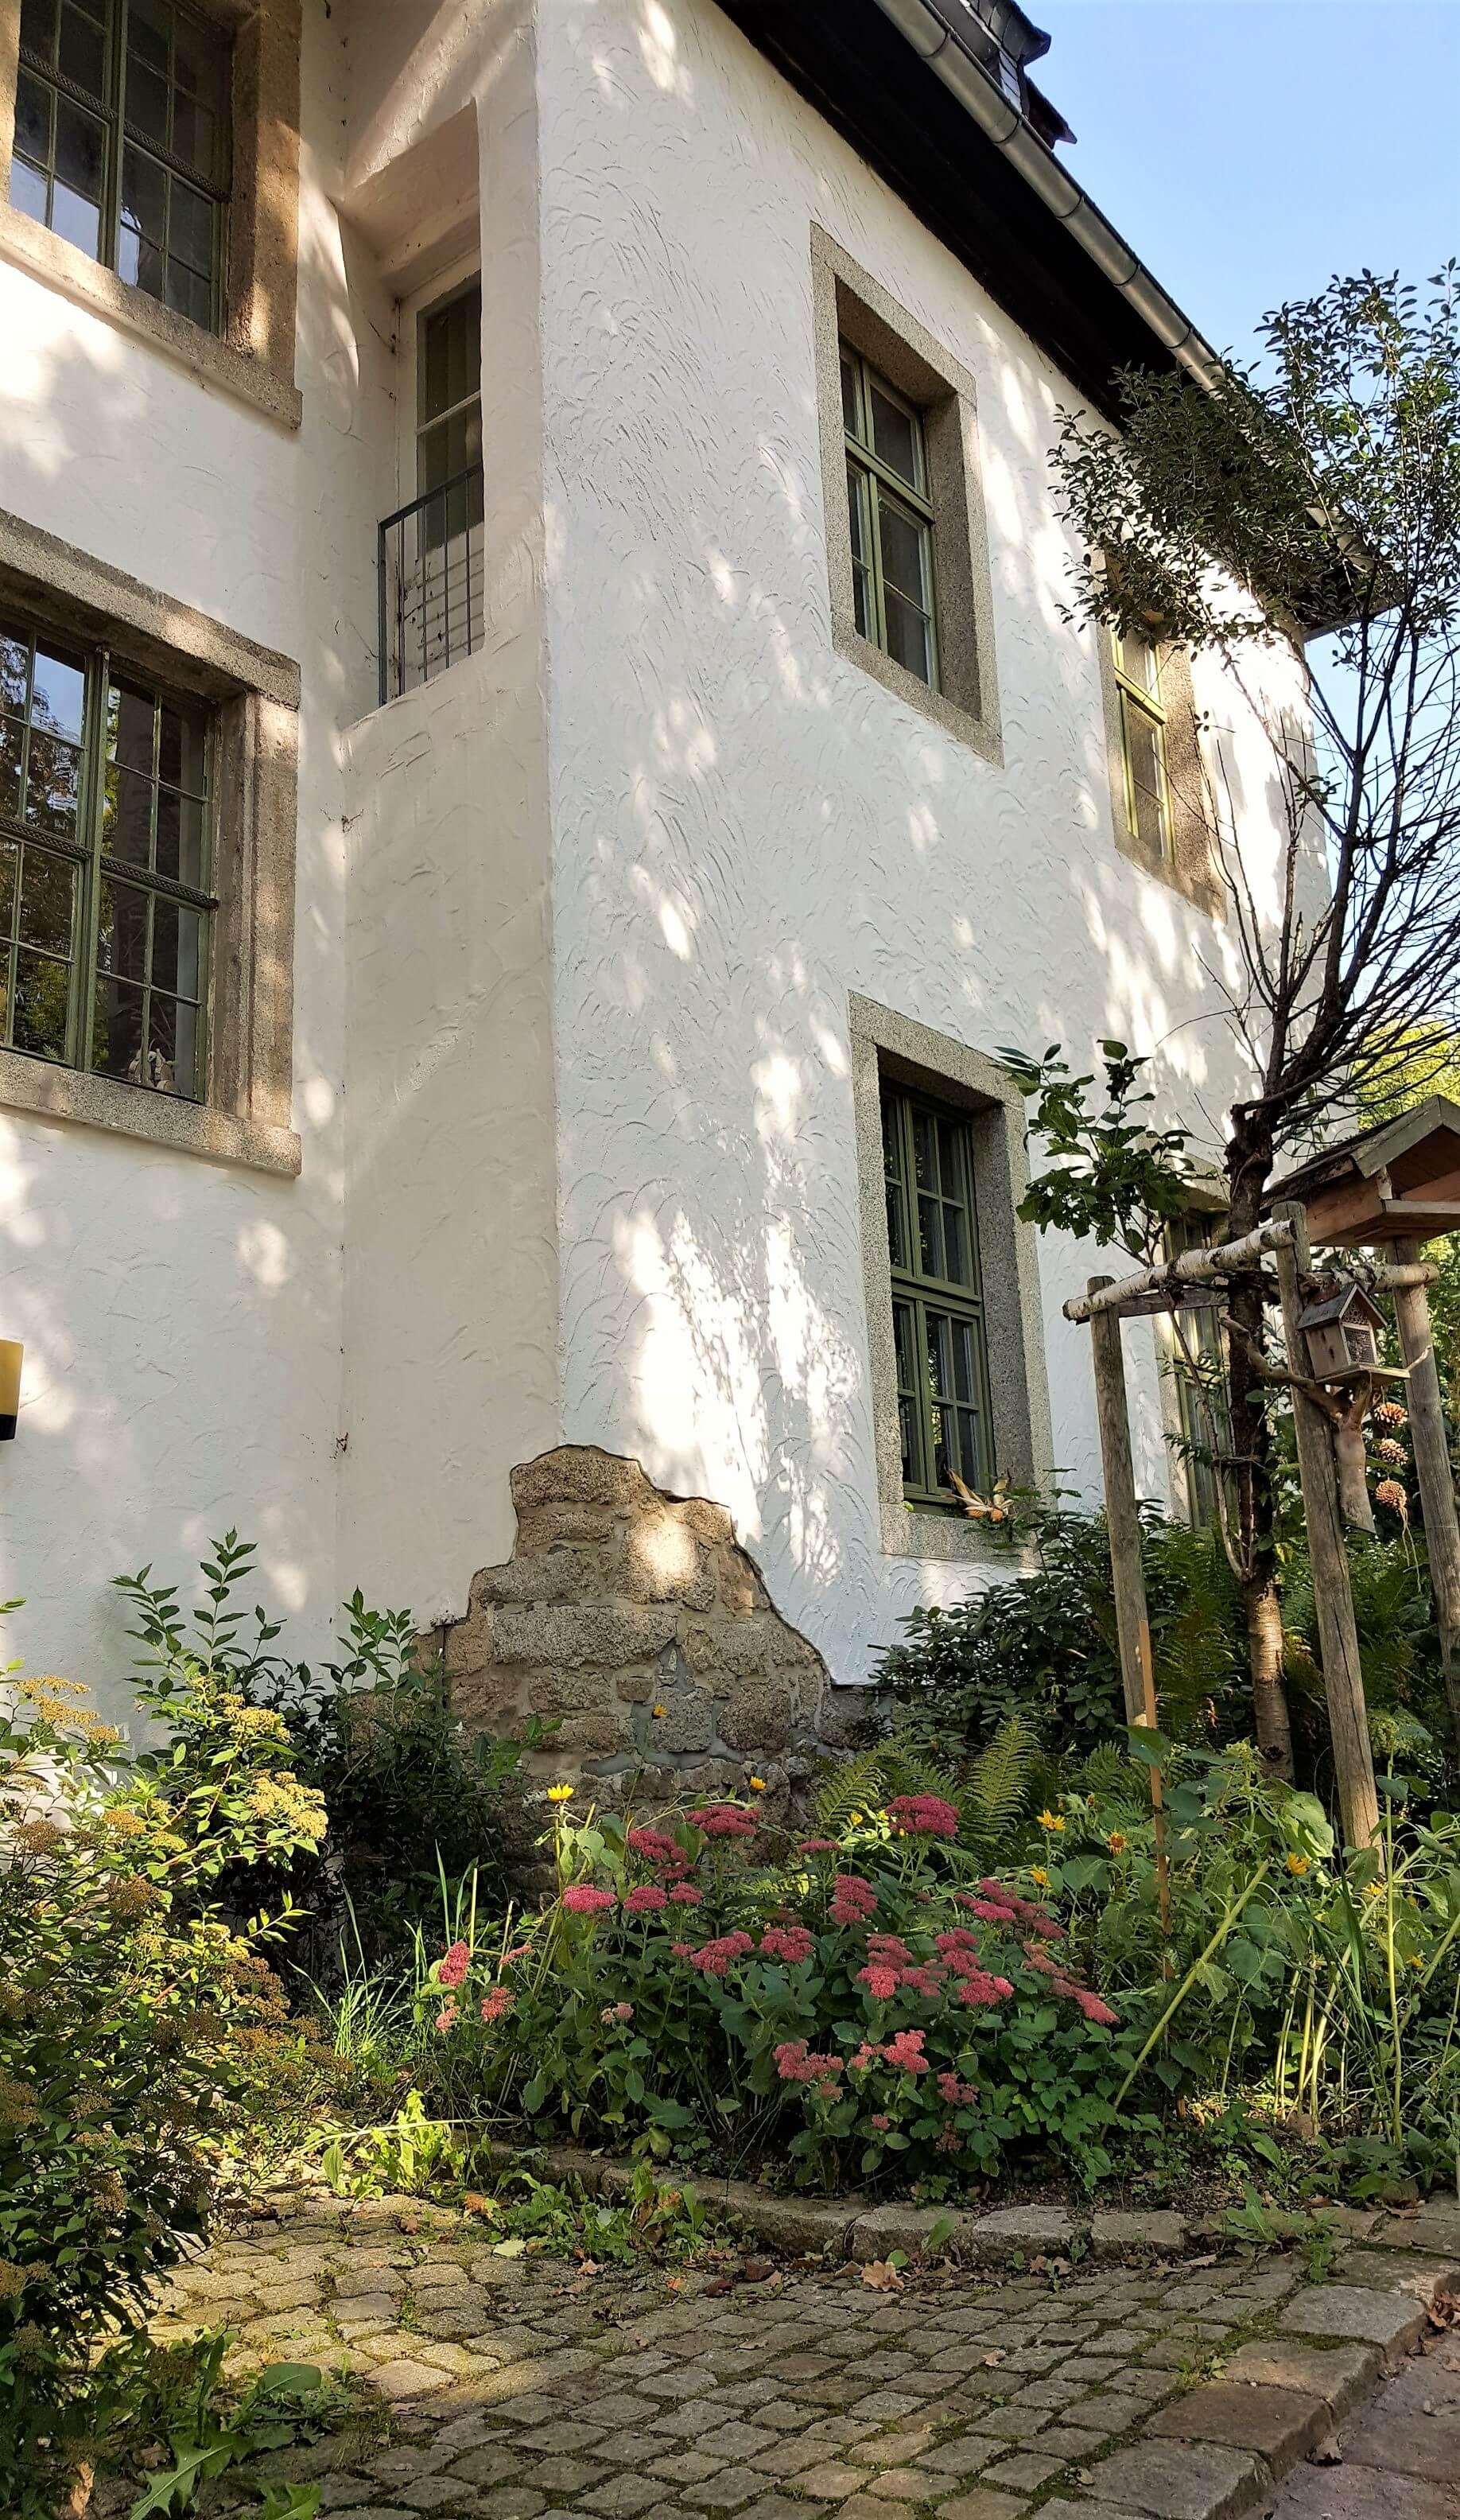 Rittergut Adlershof zu Oberlauterbach - Herrenhaus parkseitig © Jens Reiher